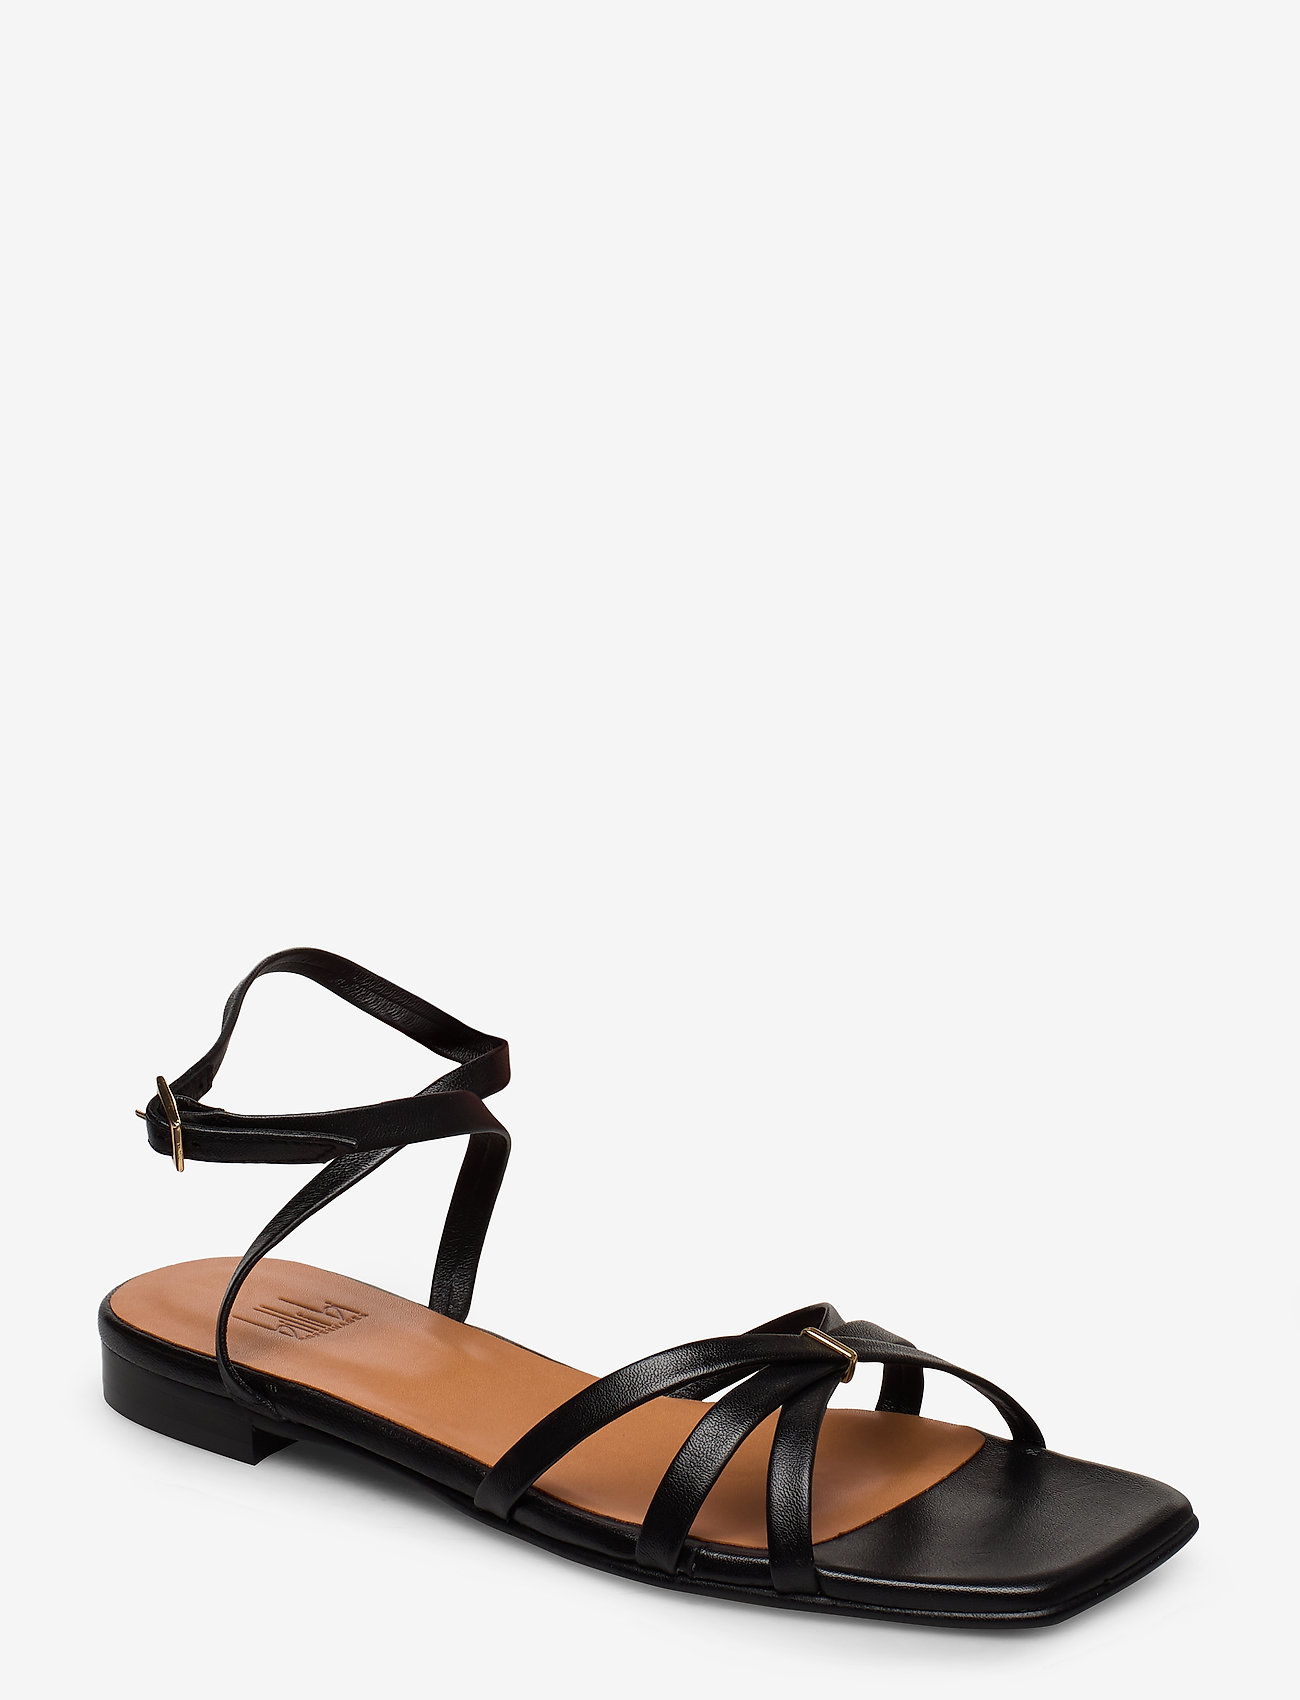 Billi Bi - Sandals 14103 - flate sandaler - black nappa 70